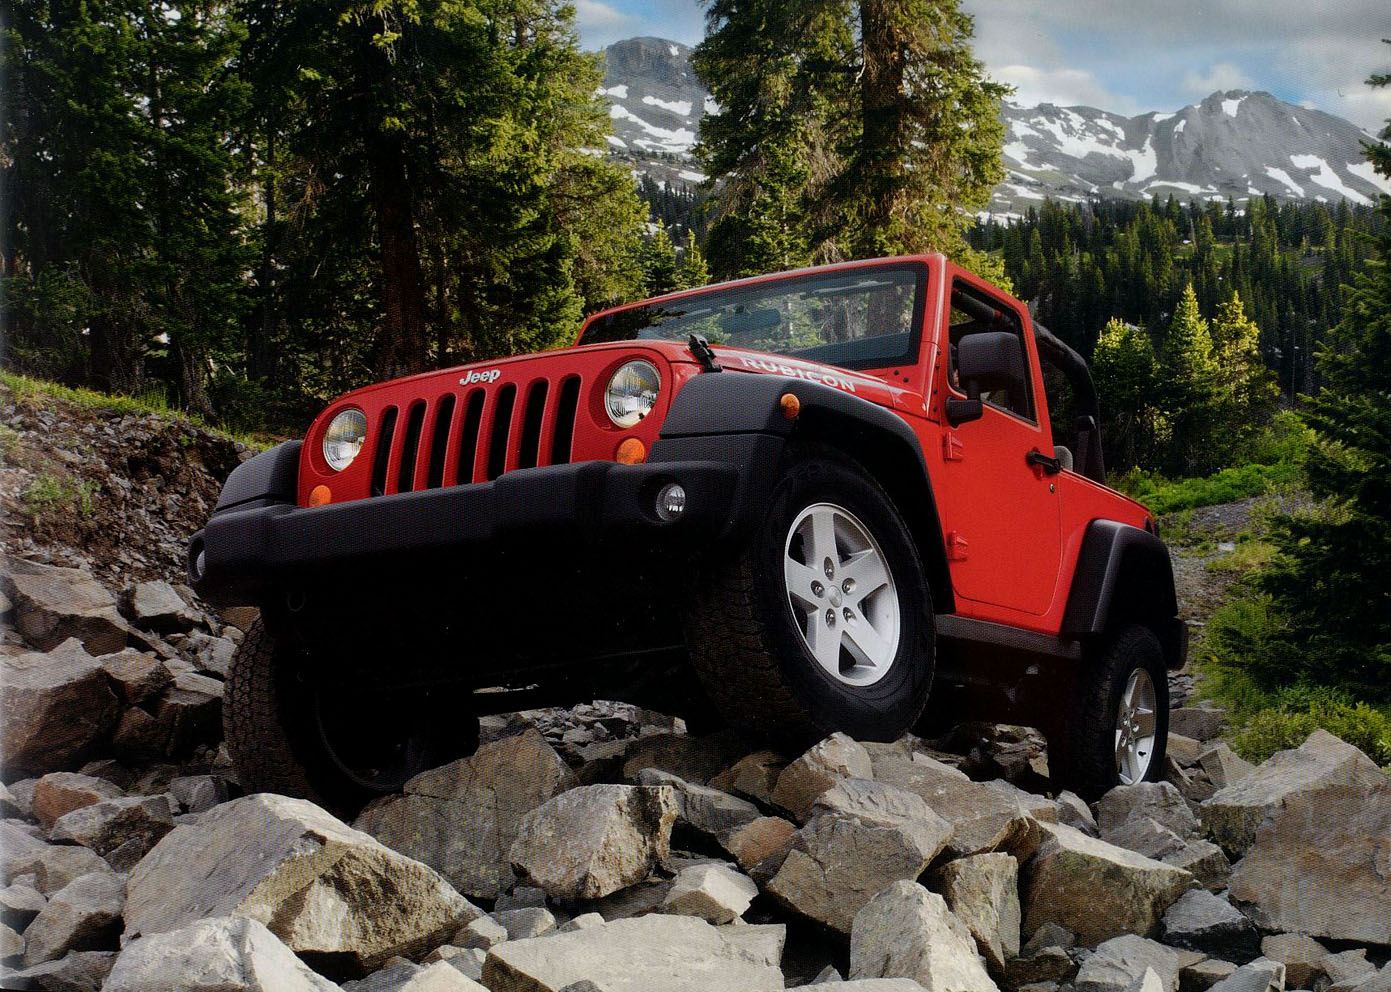 Jw Jeep Hot Cars Photoshopped Sting Gray Page 3 2018 Jeep